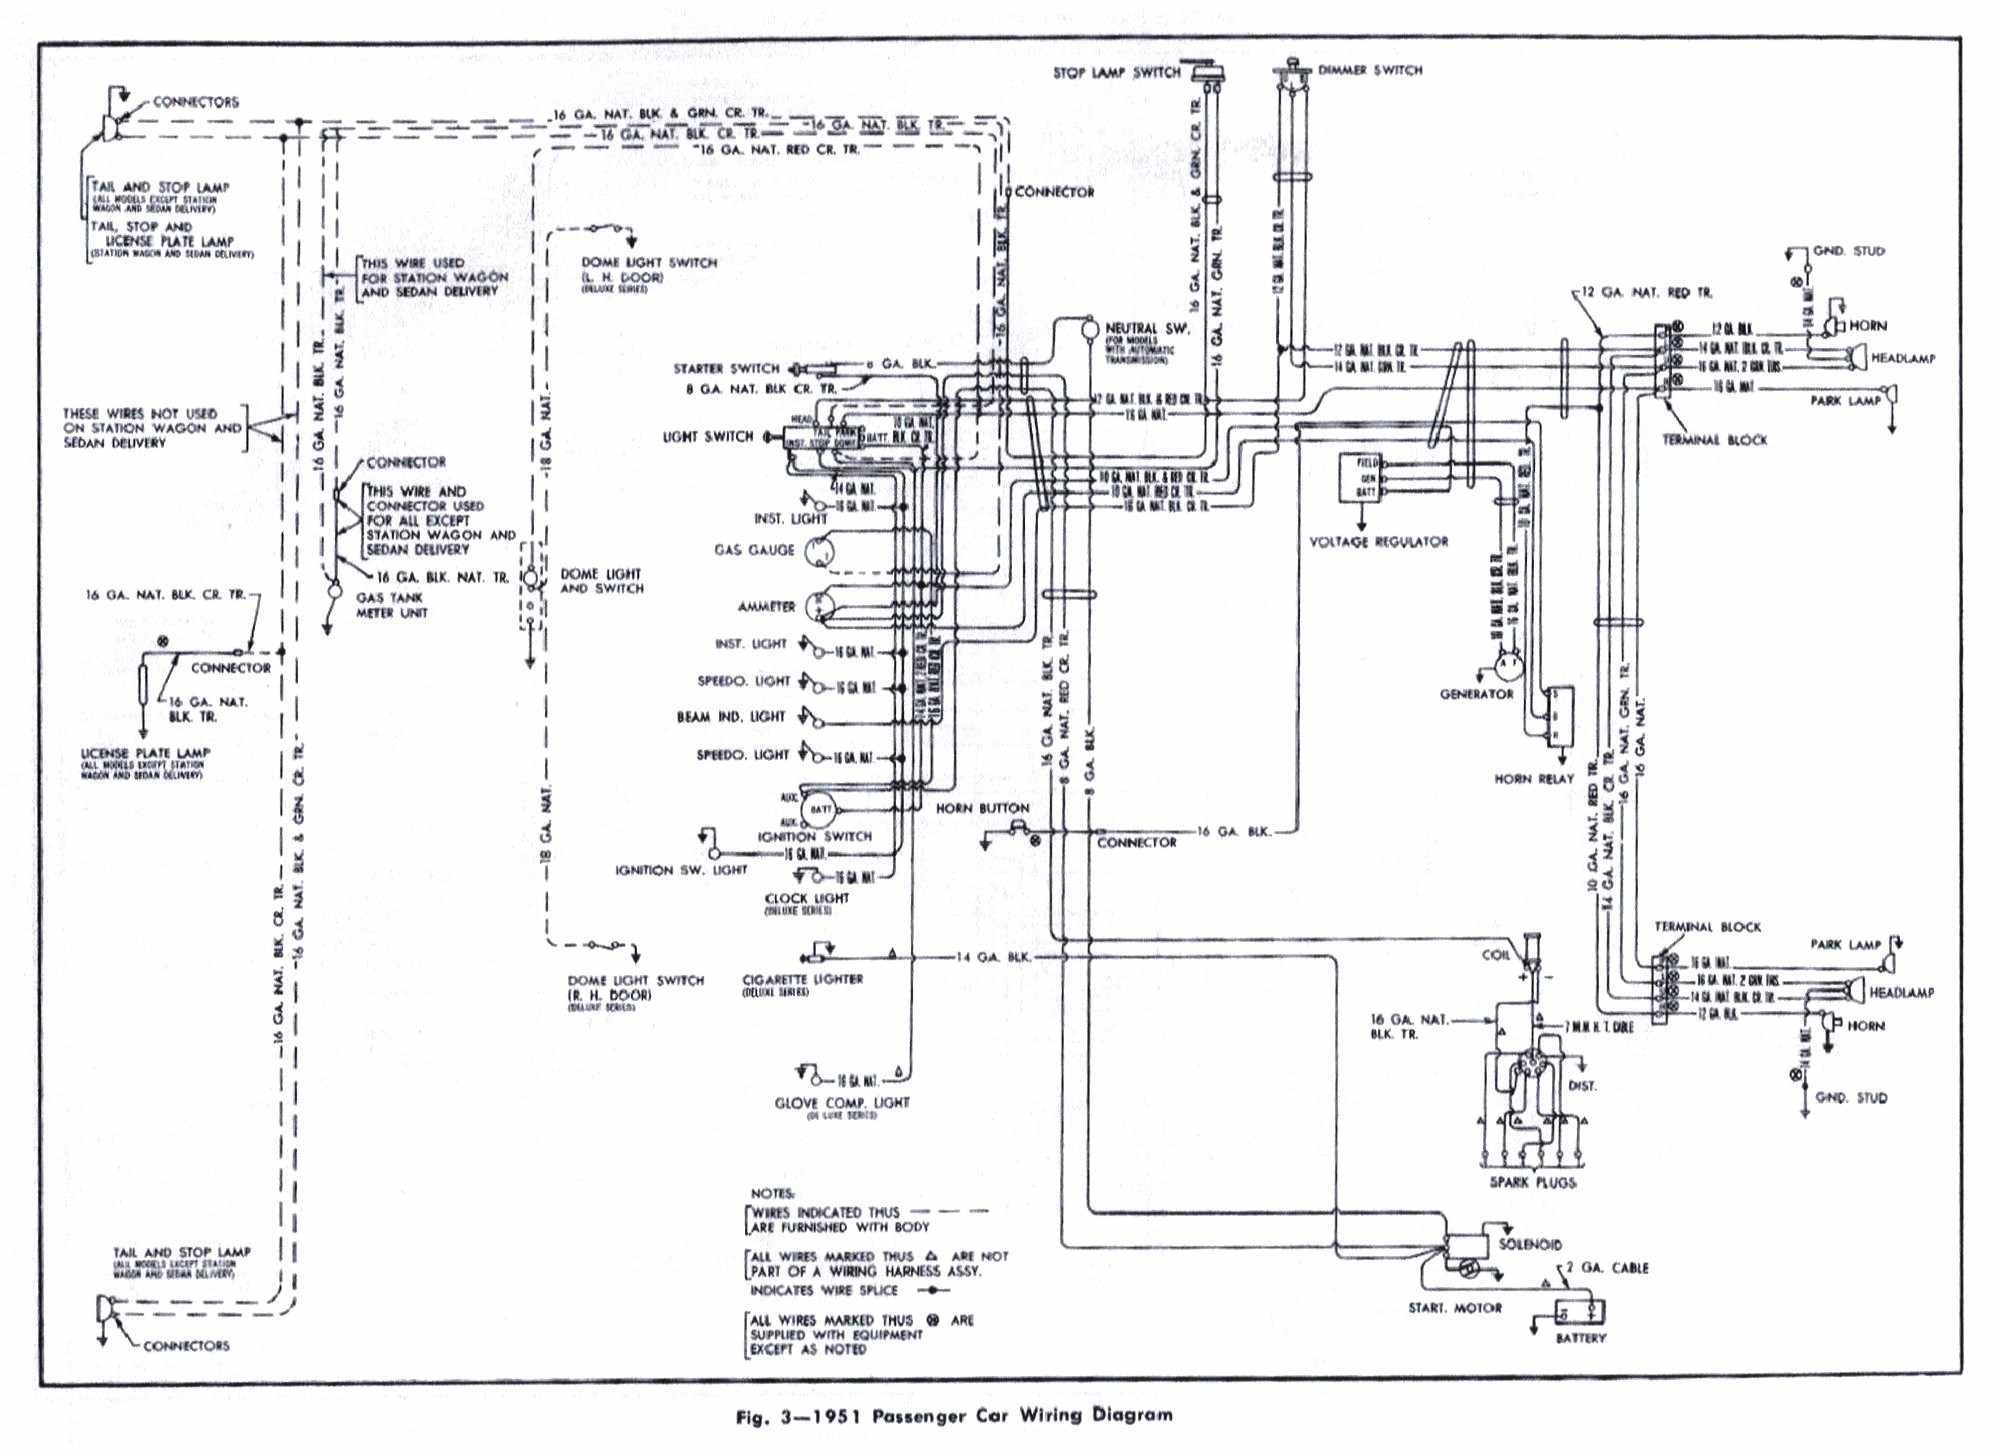 CHEVROLET - Car PDF Manual, Wiring Diagram & Fault Codes DTC | 2012 Chevy Volt Wiring Diagram |  | CAR PDF Manuals & Fault Codes DTC